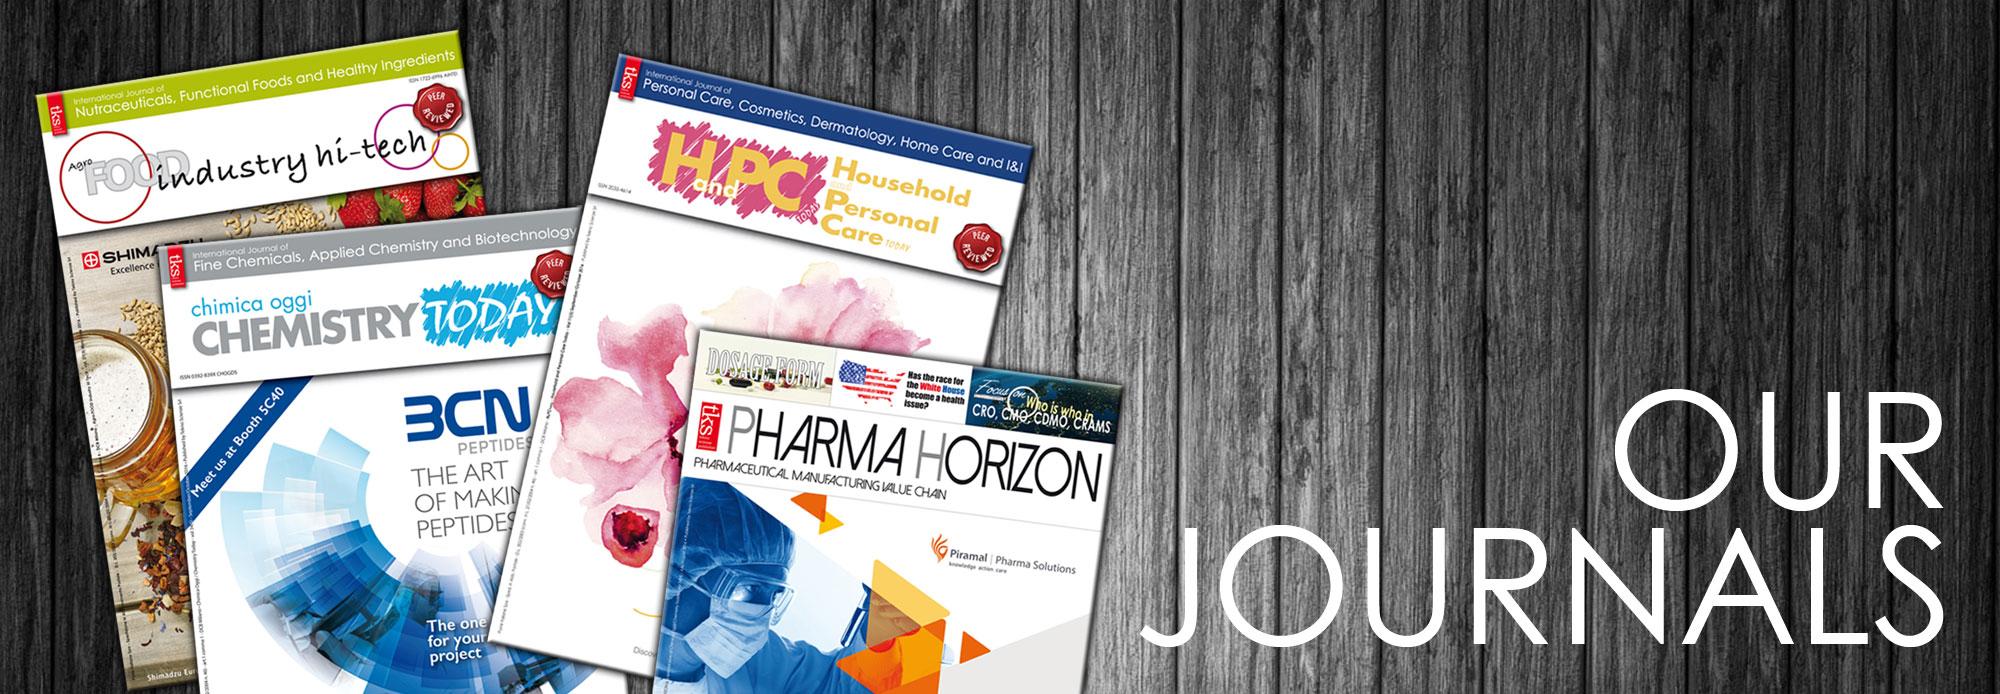 banner_home_journals